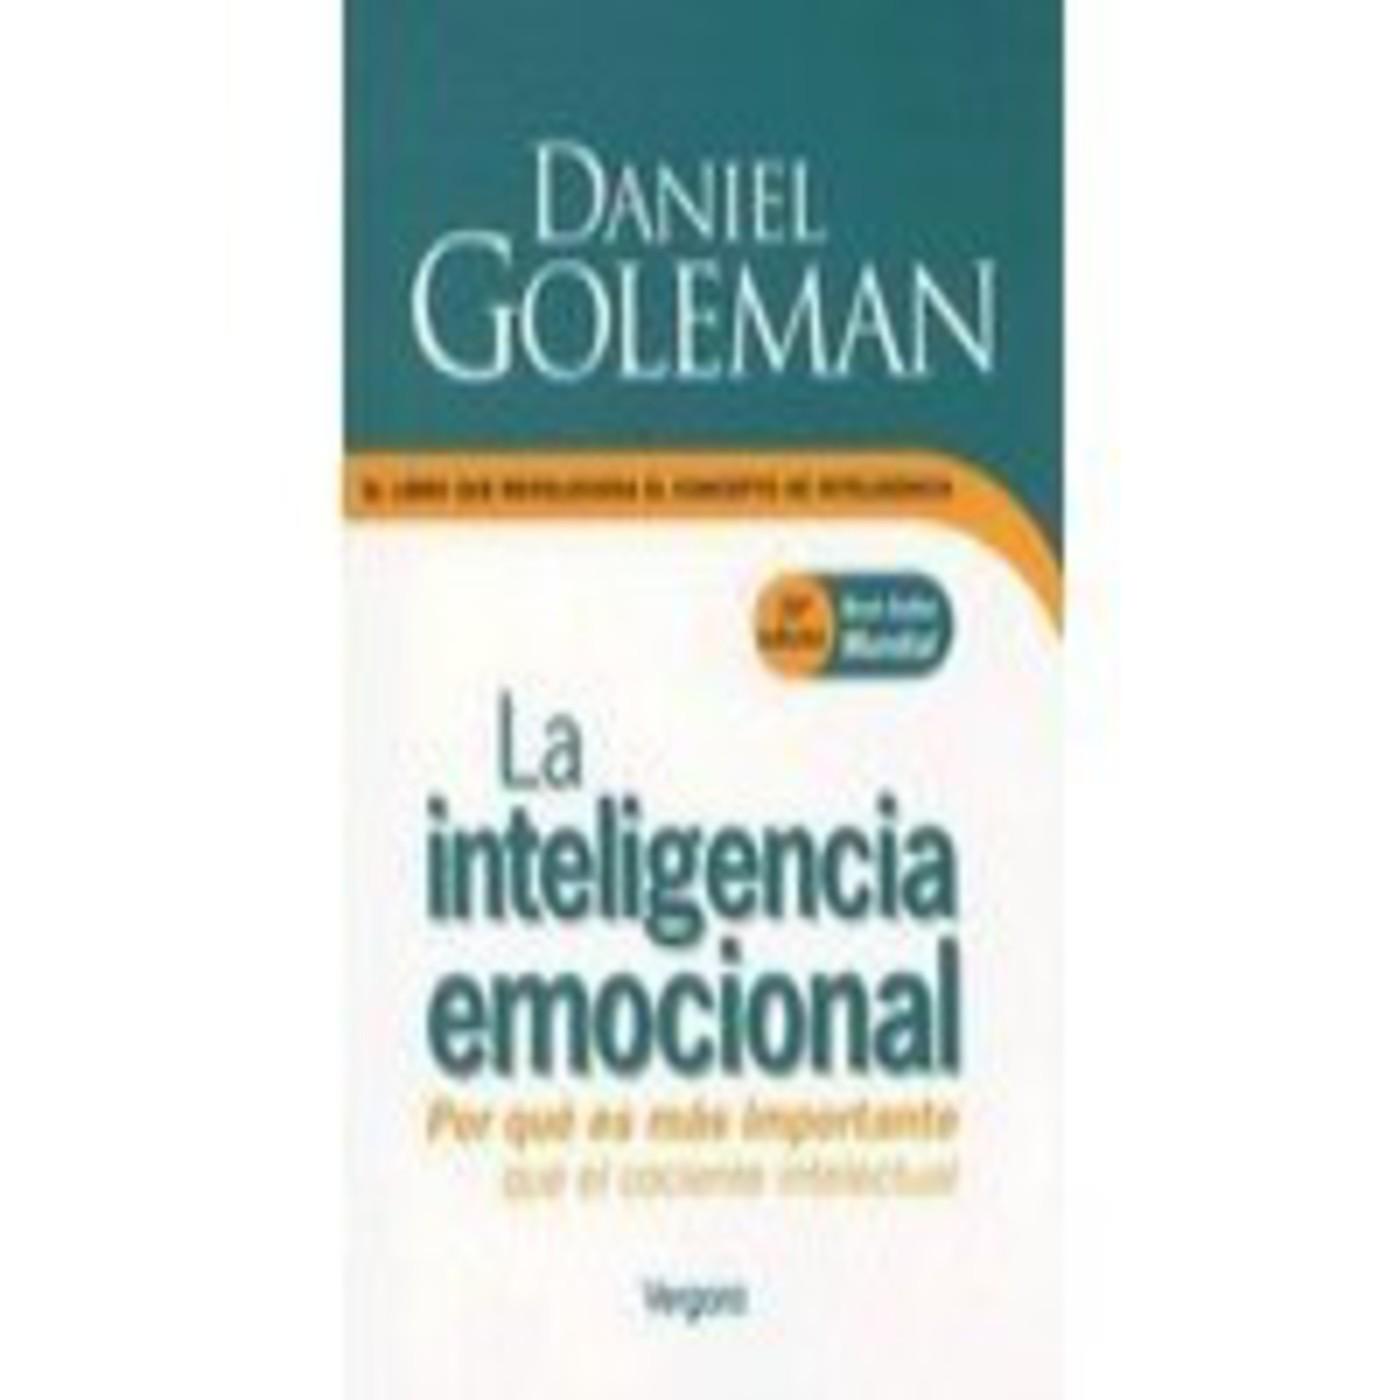 49..INTELIGENCIA EMOCIONAL, Daniel Goleman